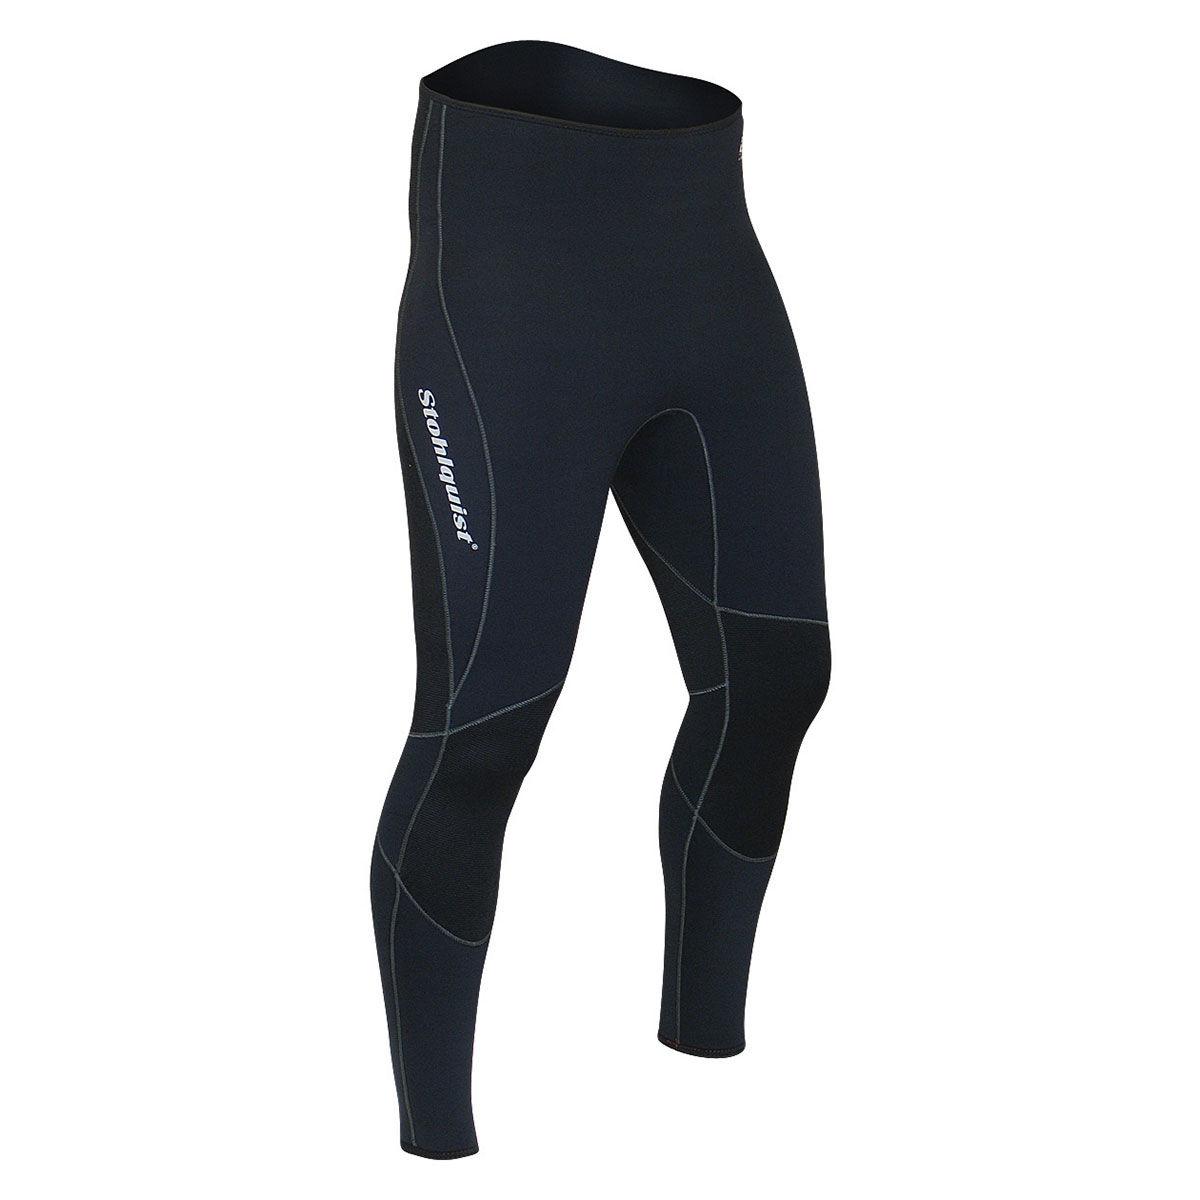 photo: Stohlquist Rapid Pants wet suit